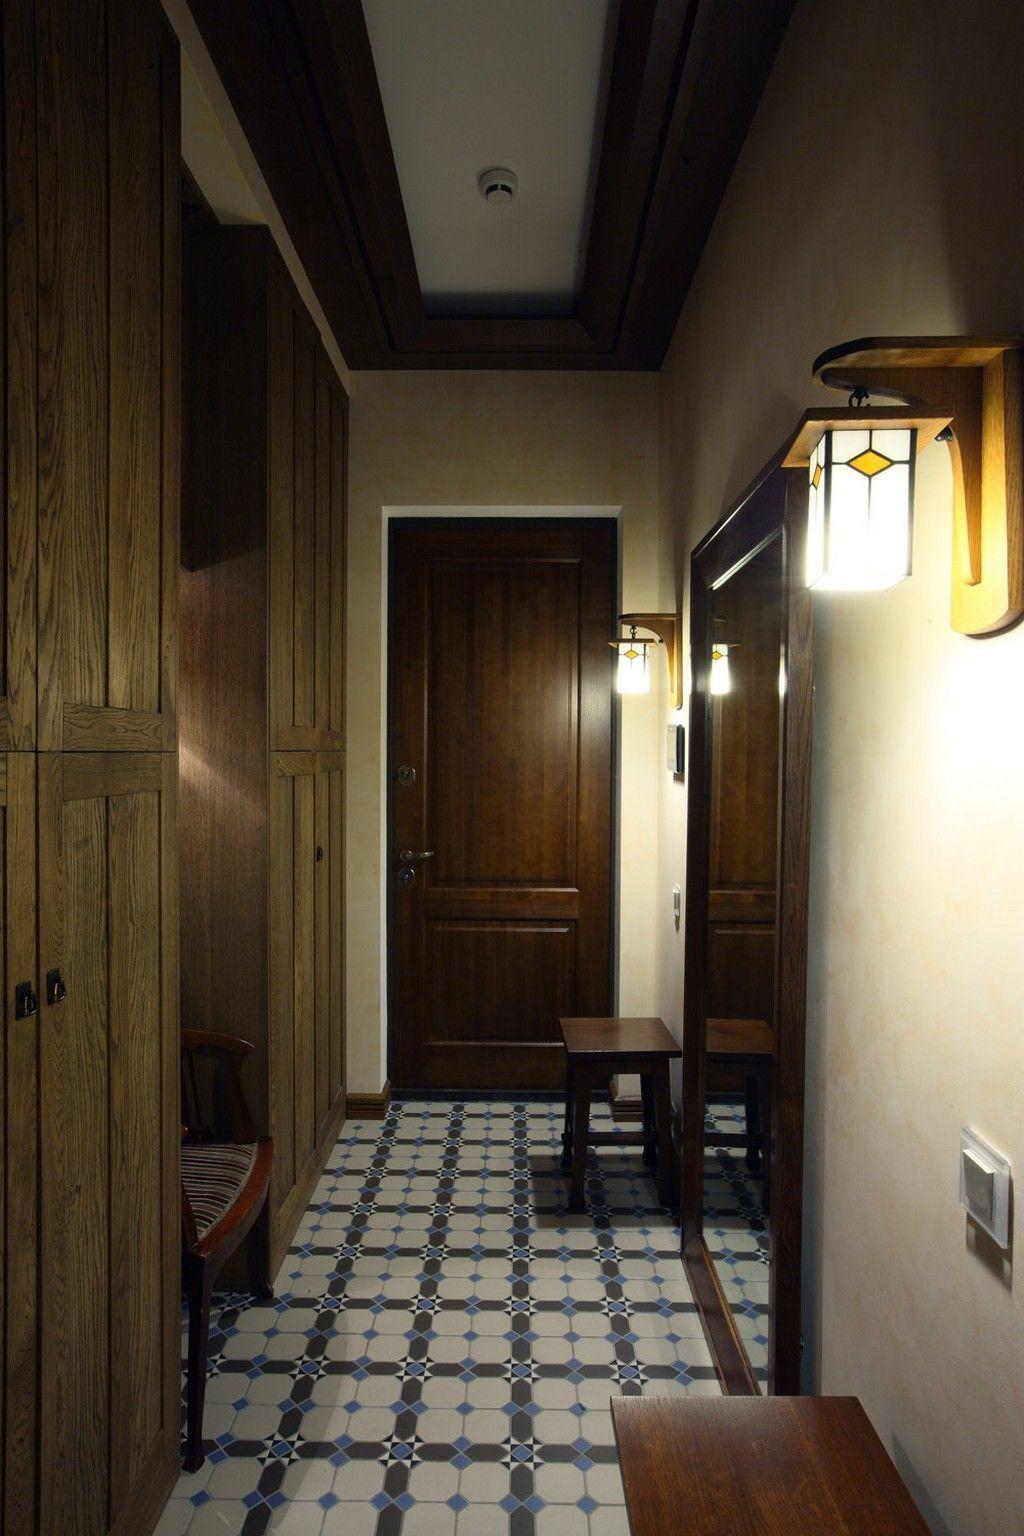 Плитка на полу в узком коридоре